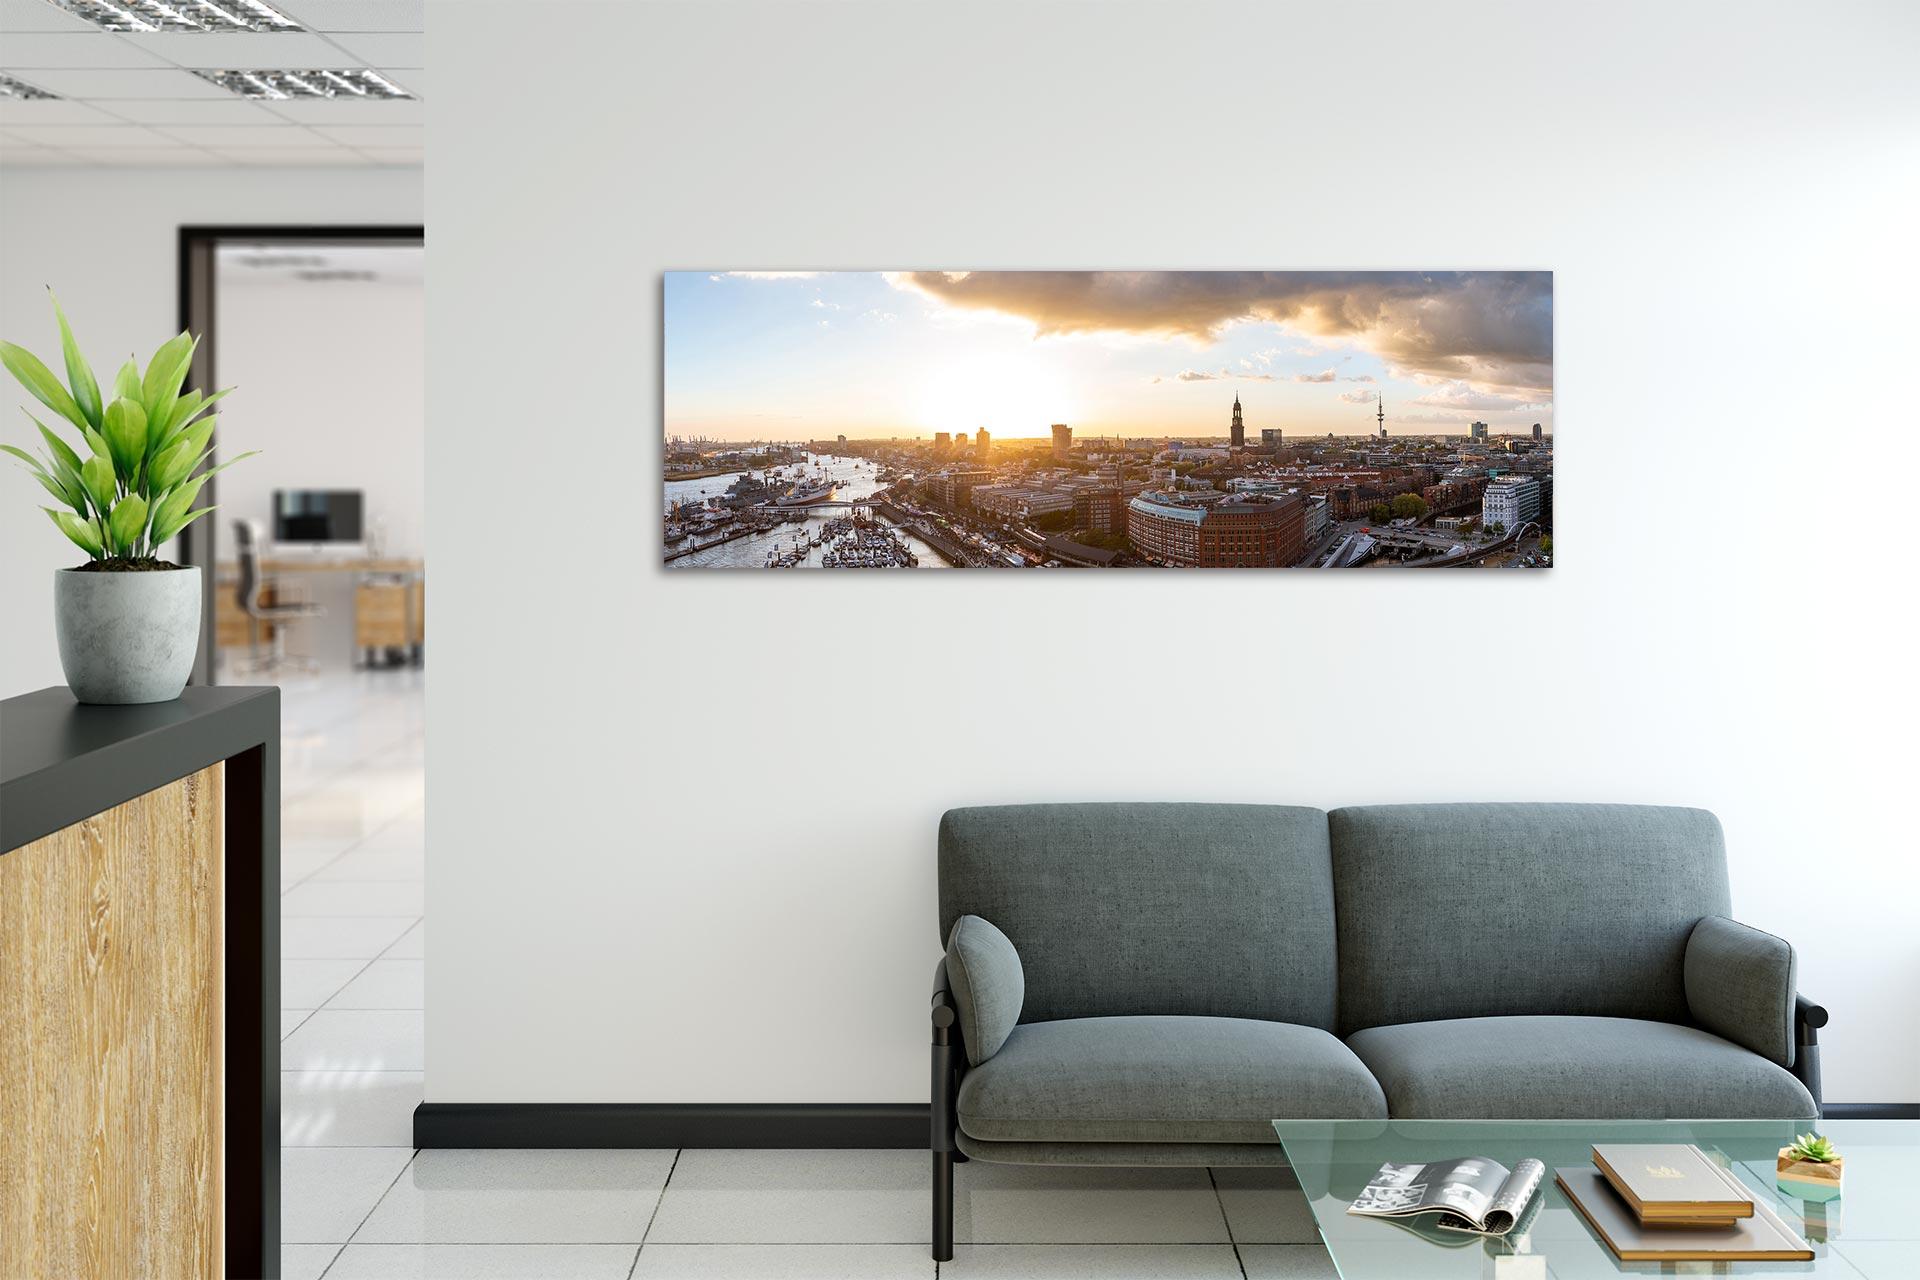 JS306-panorama-hafen-wandbild-auf-leinwand-acrylglas-aludibond-empfang